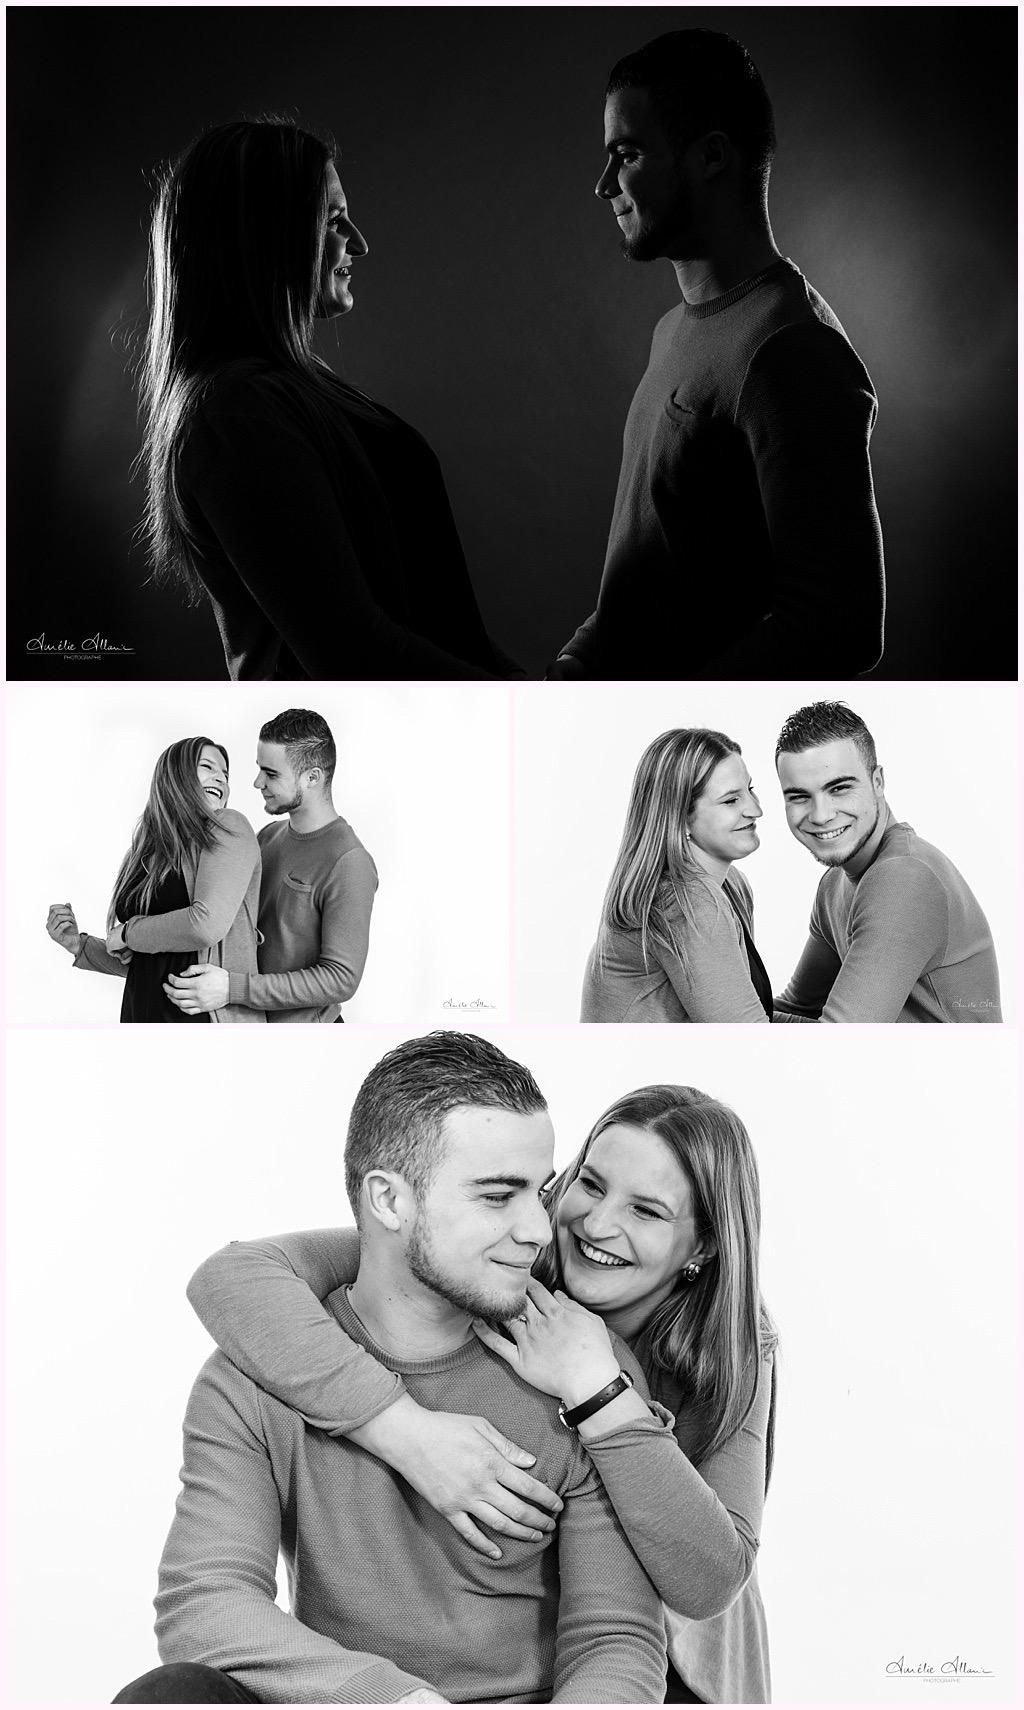 séance photo couple beloved session photographe studio pontcharra grenoble chambery aurelie allanic